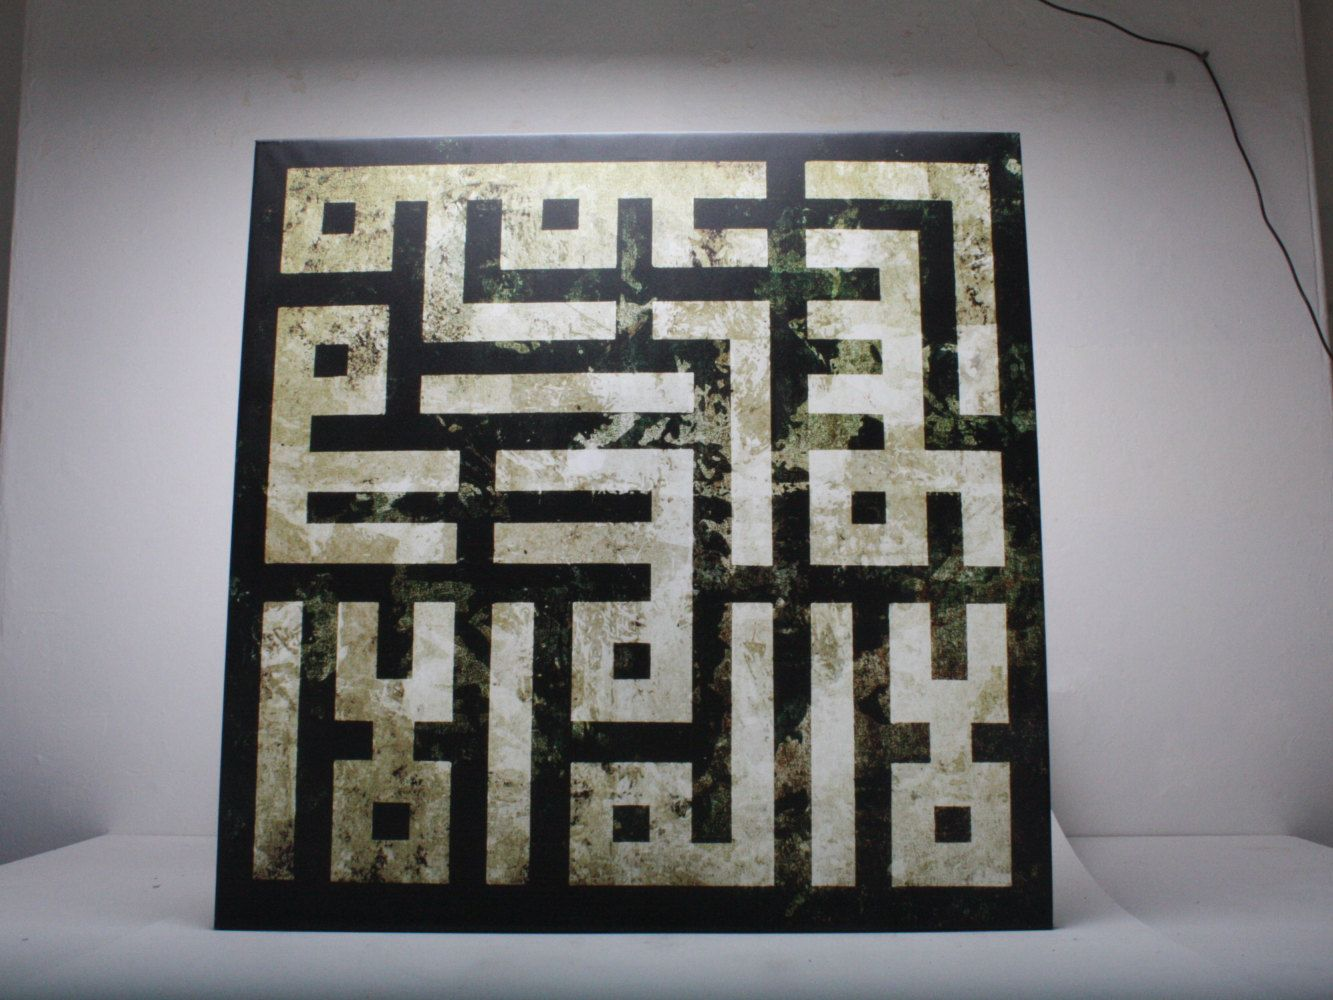 Gift framed canvas wall art modern arabic kufic calligraphy la